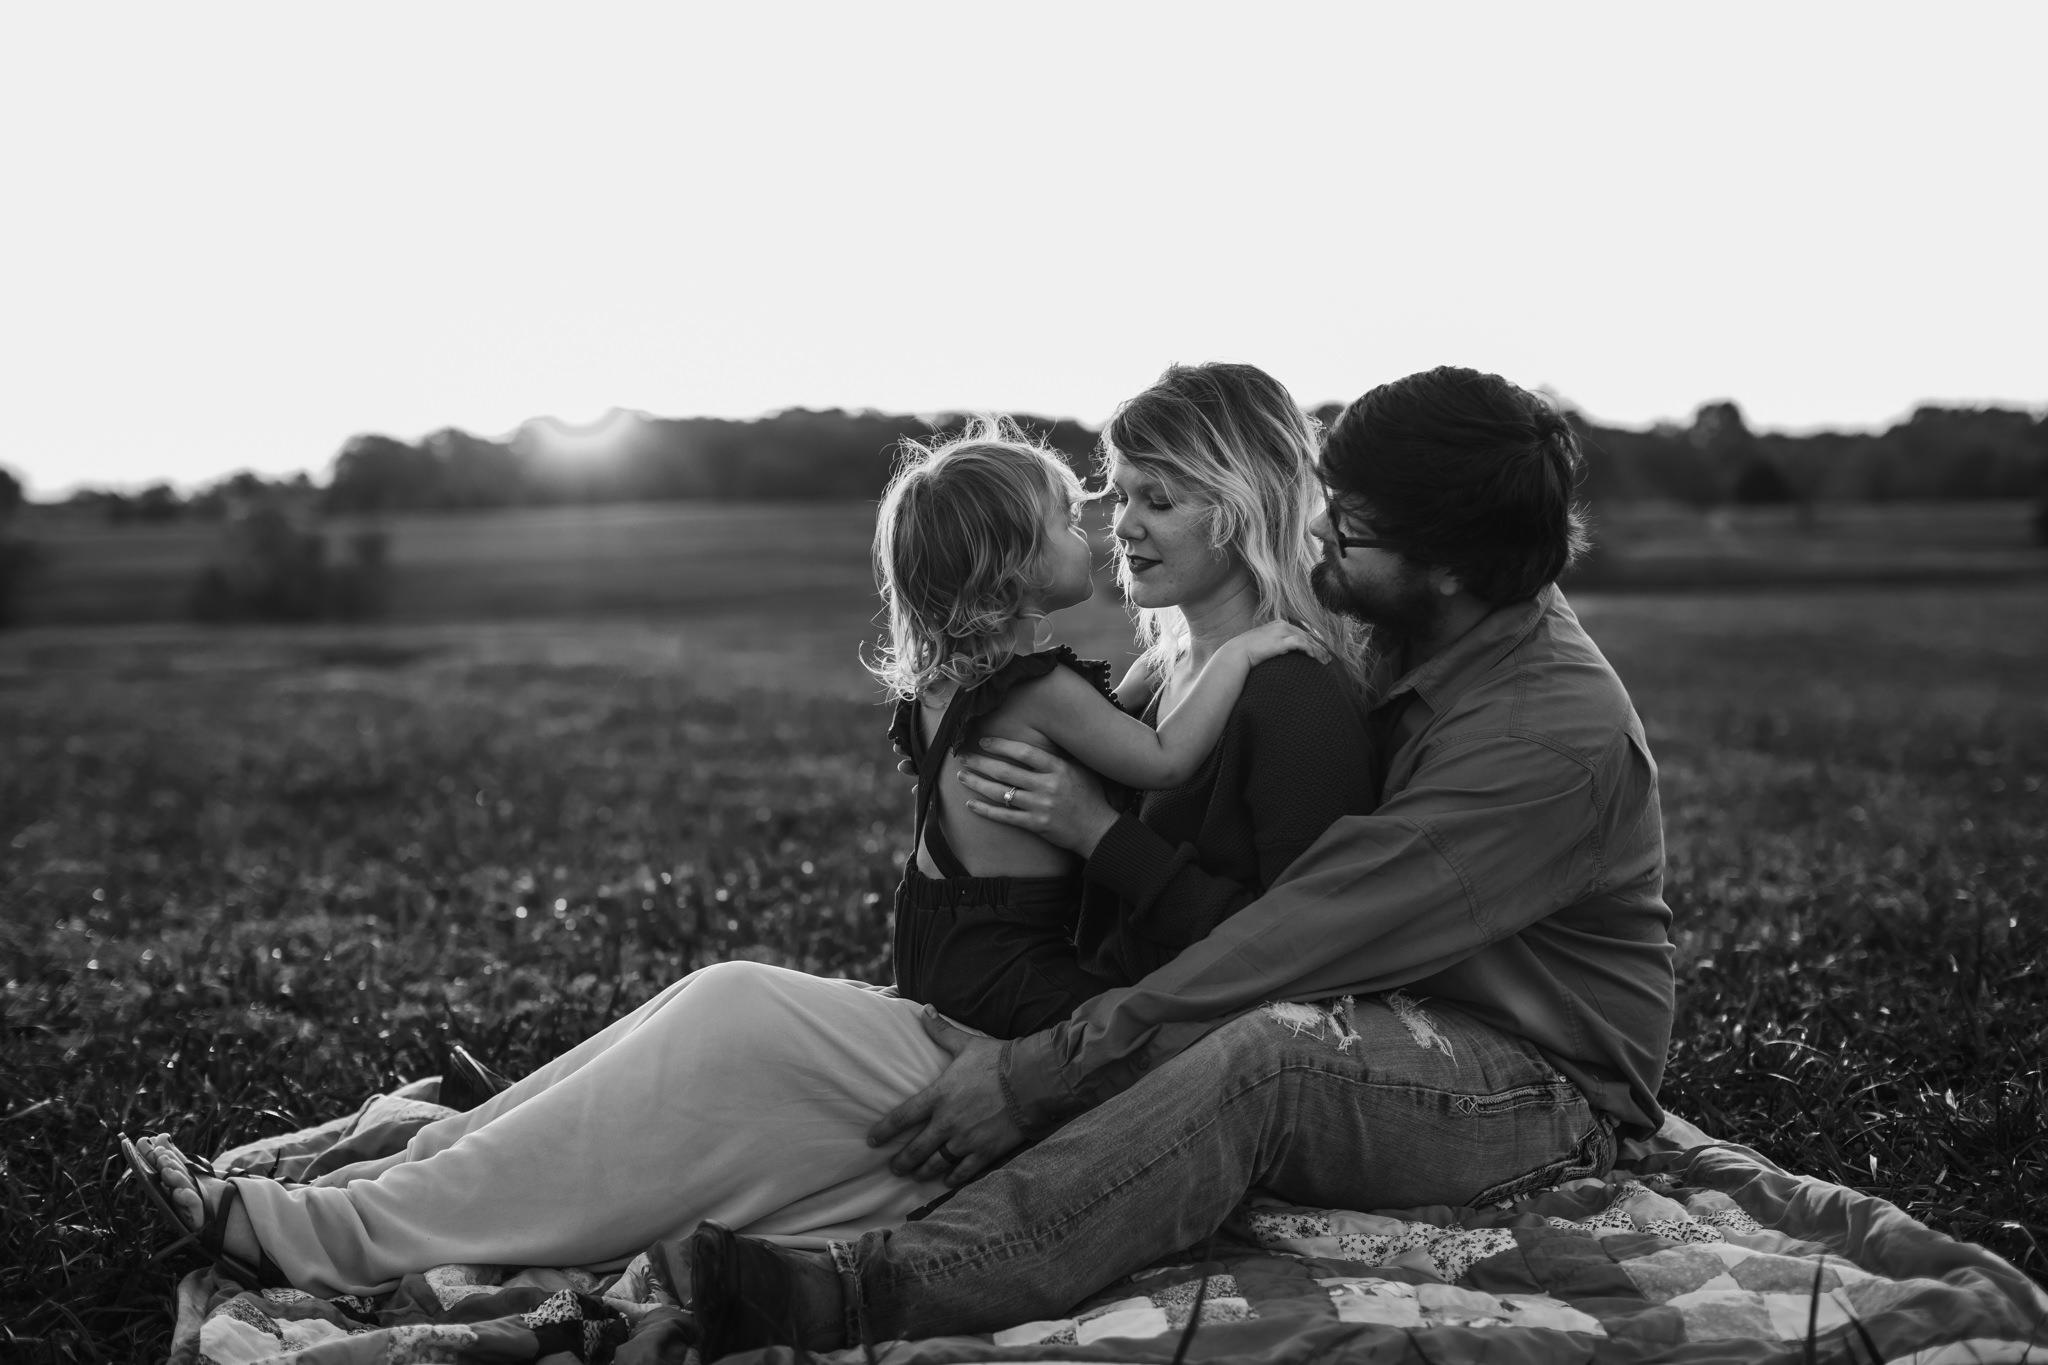 cassie-cook-photography-memphis-family-photographer-lifestyle-family-photographer-sunrise-gray-family-13.jpg